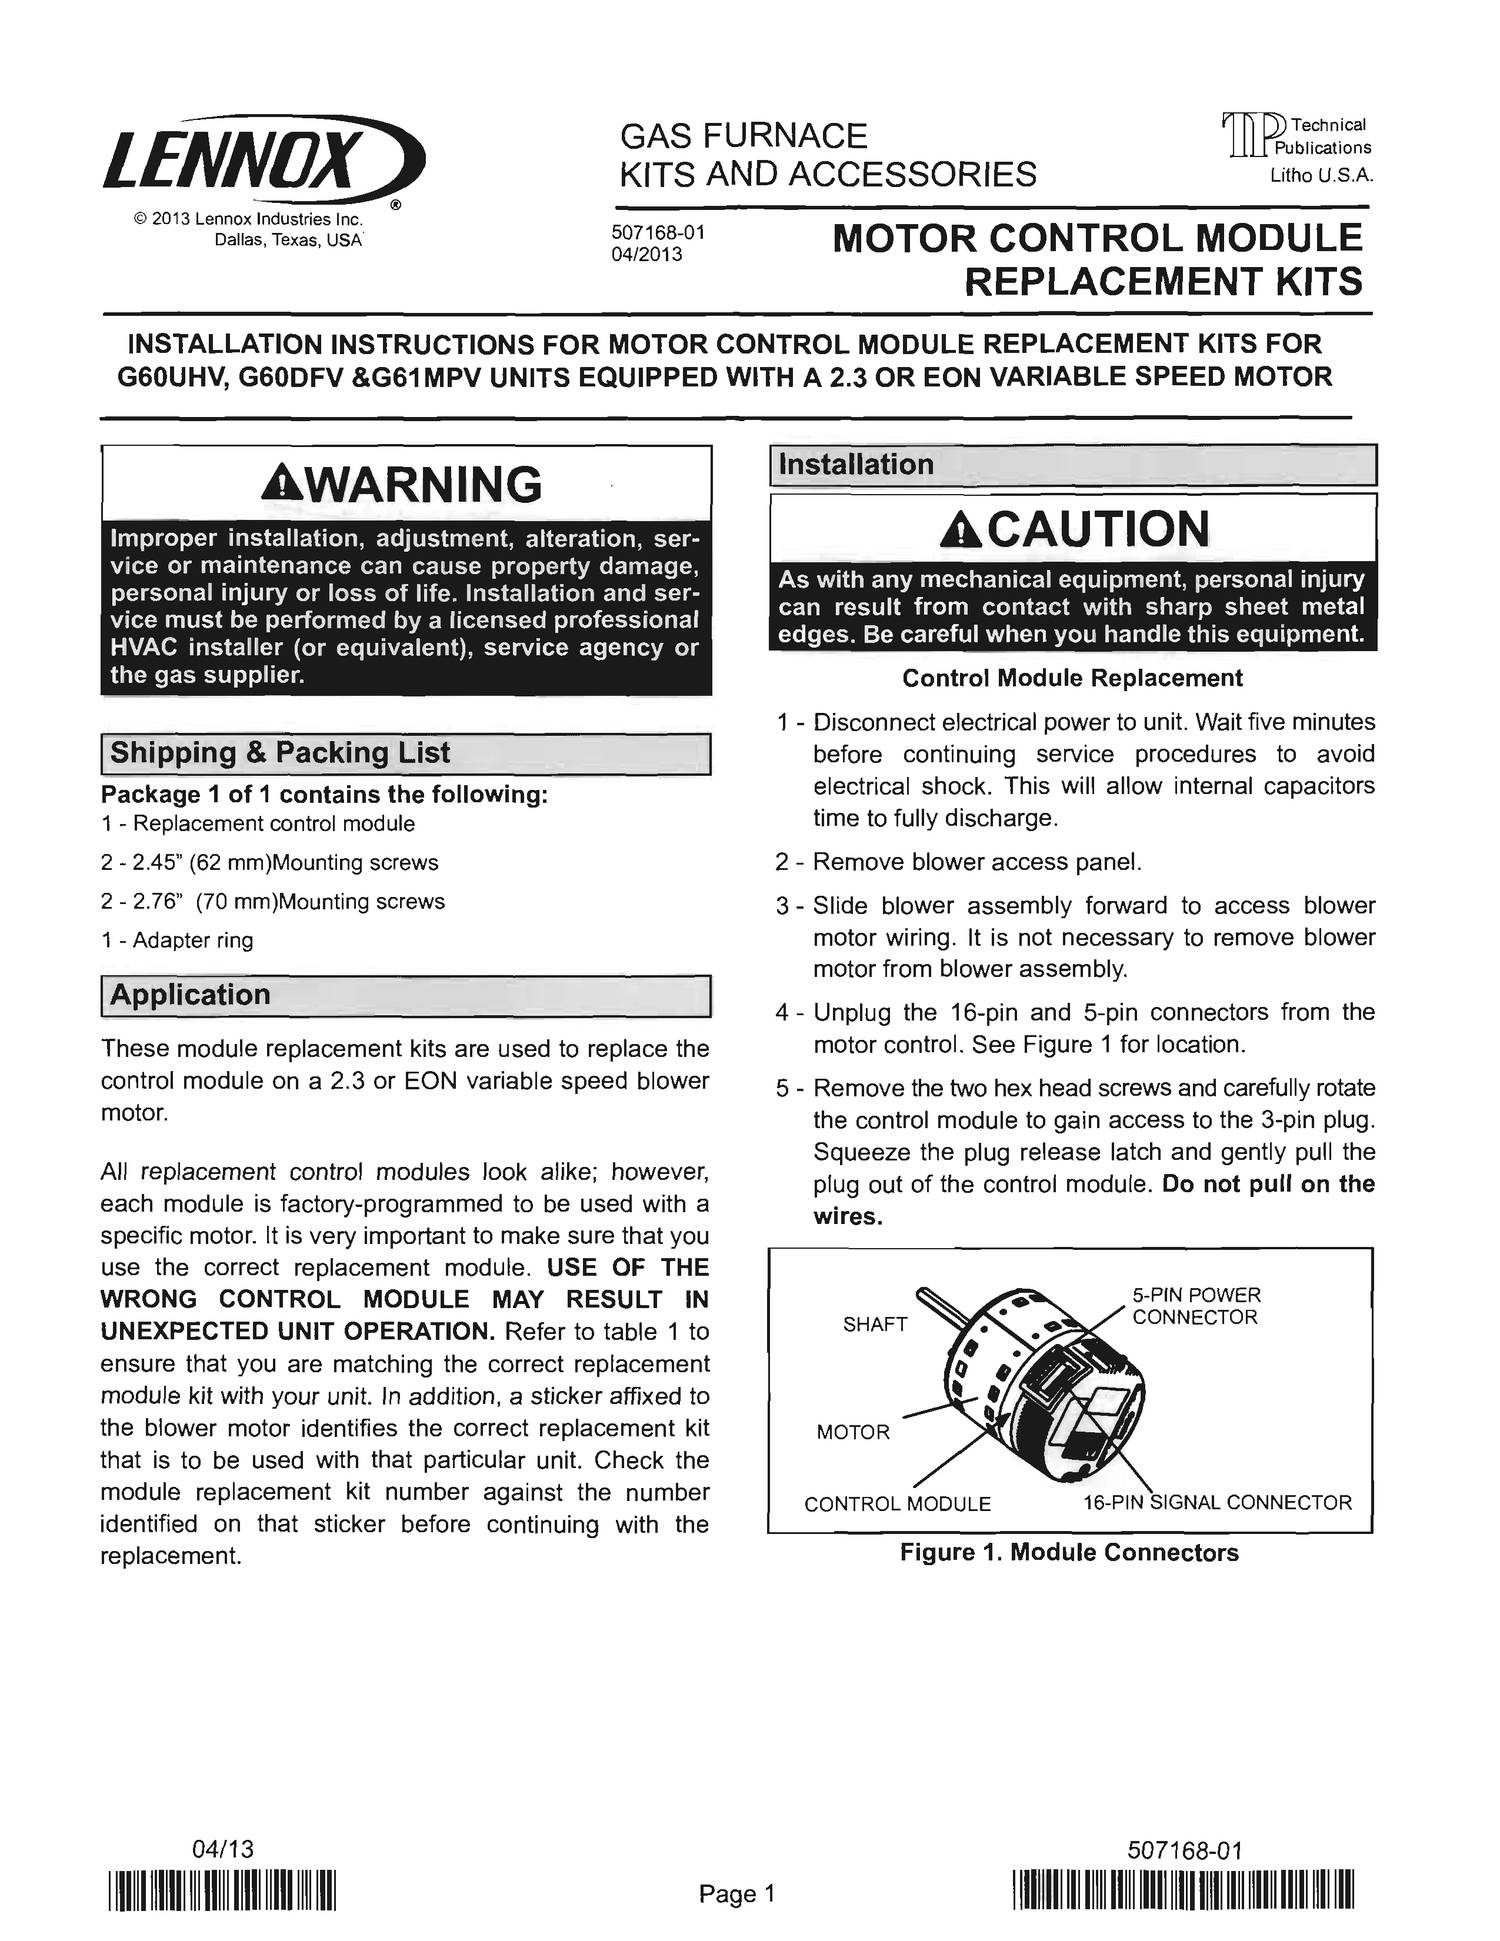 Lennox 10M08 Motor Control Module Replacement.pdf - DocDroid